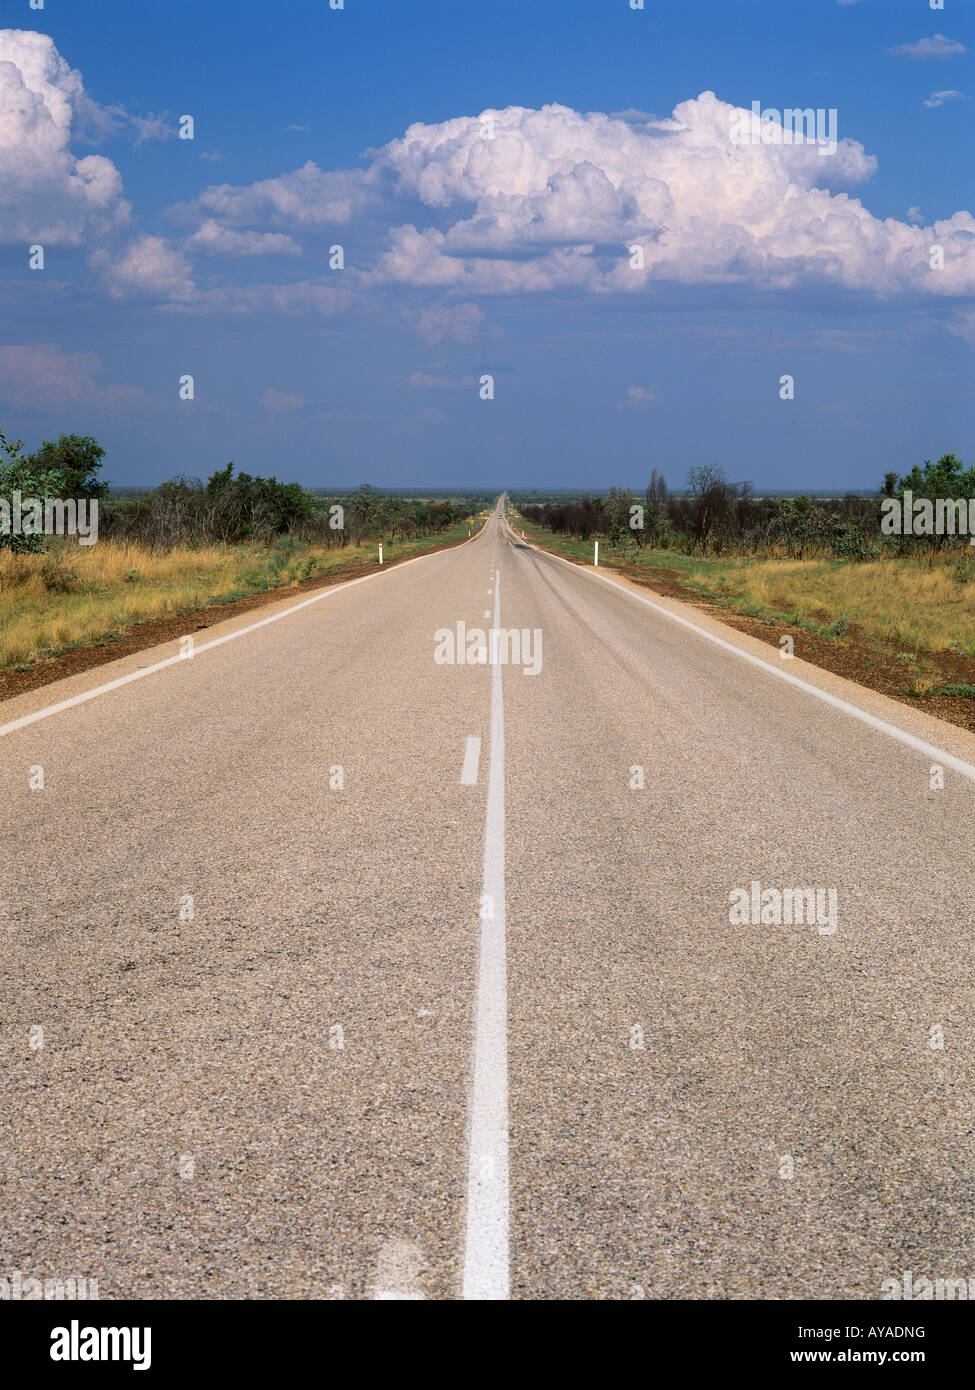 Great Northern Highway road in the Kimberley region Western Australia Australia Stock Photo